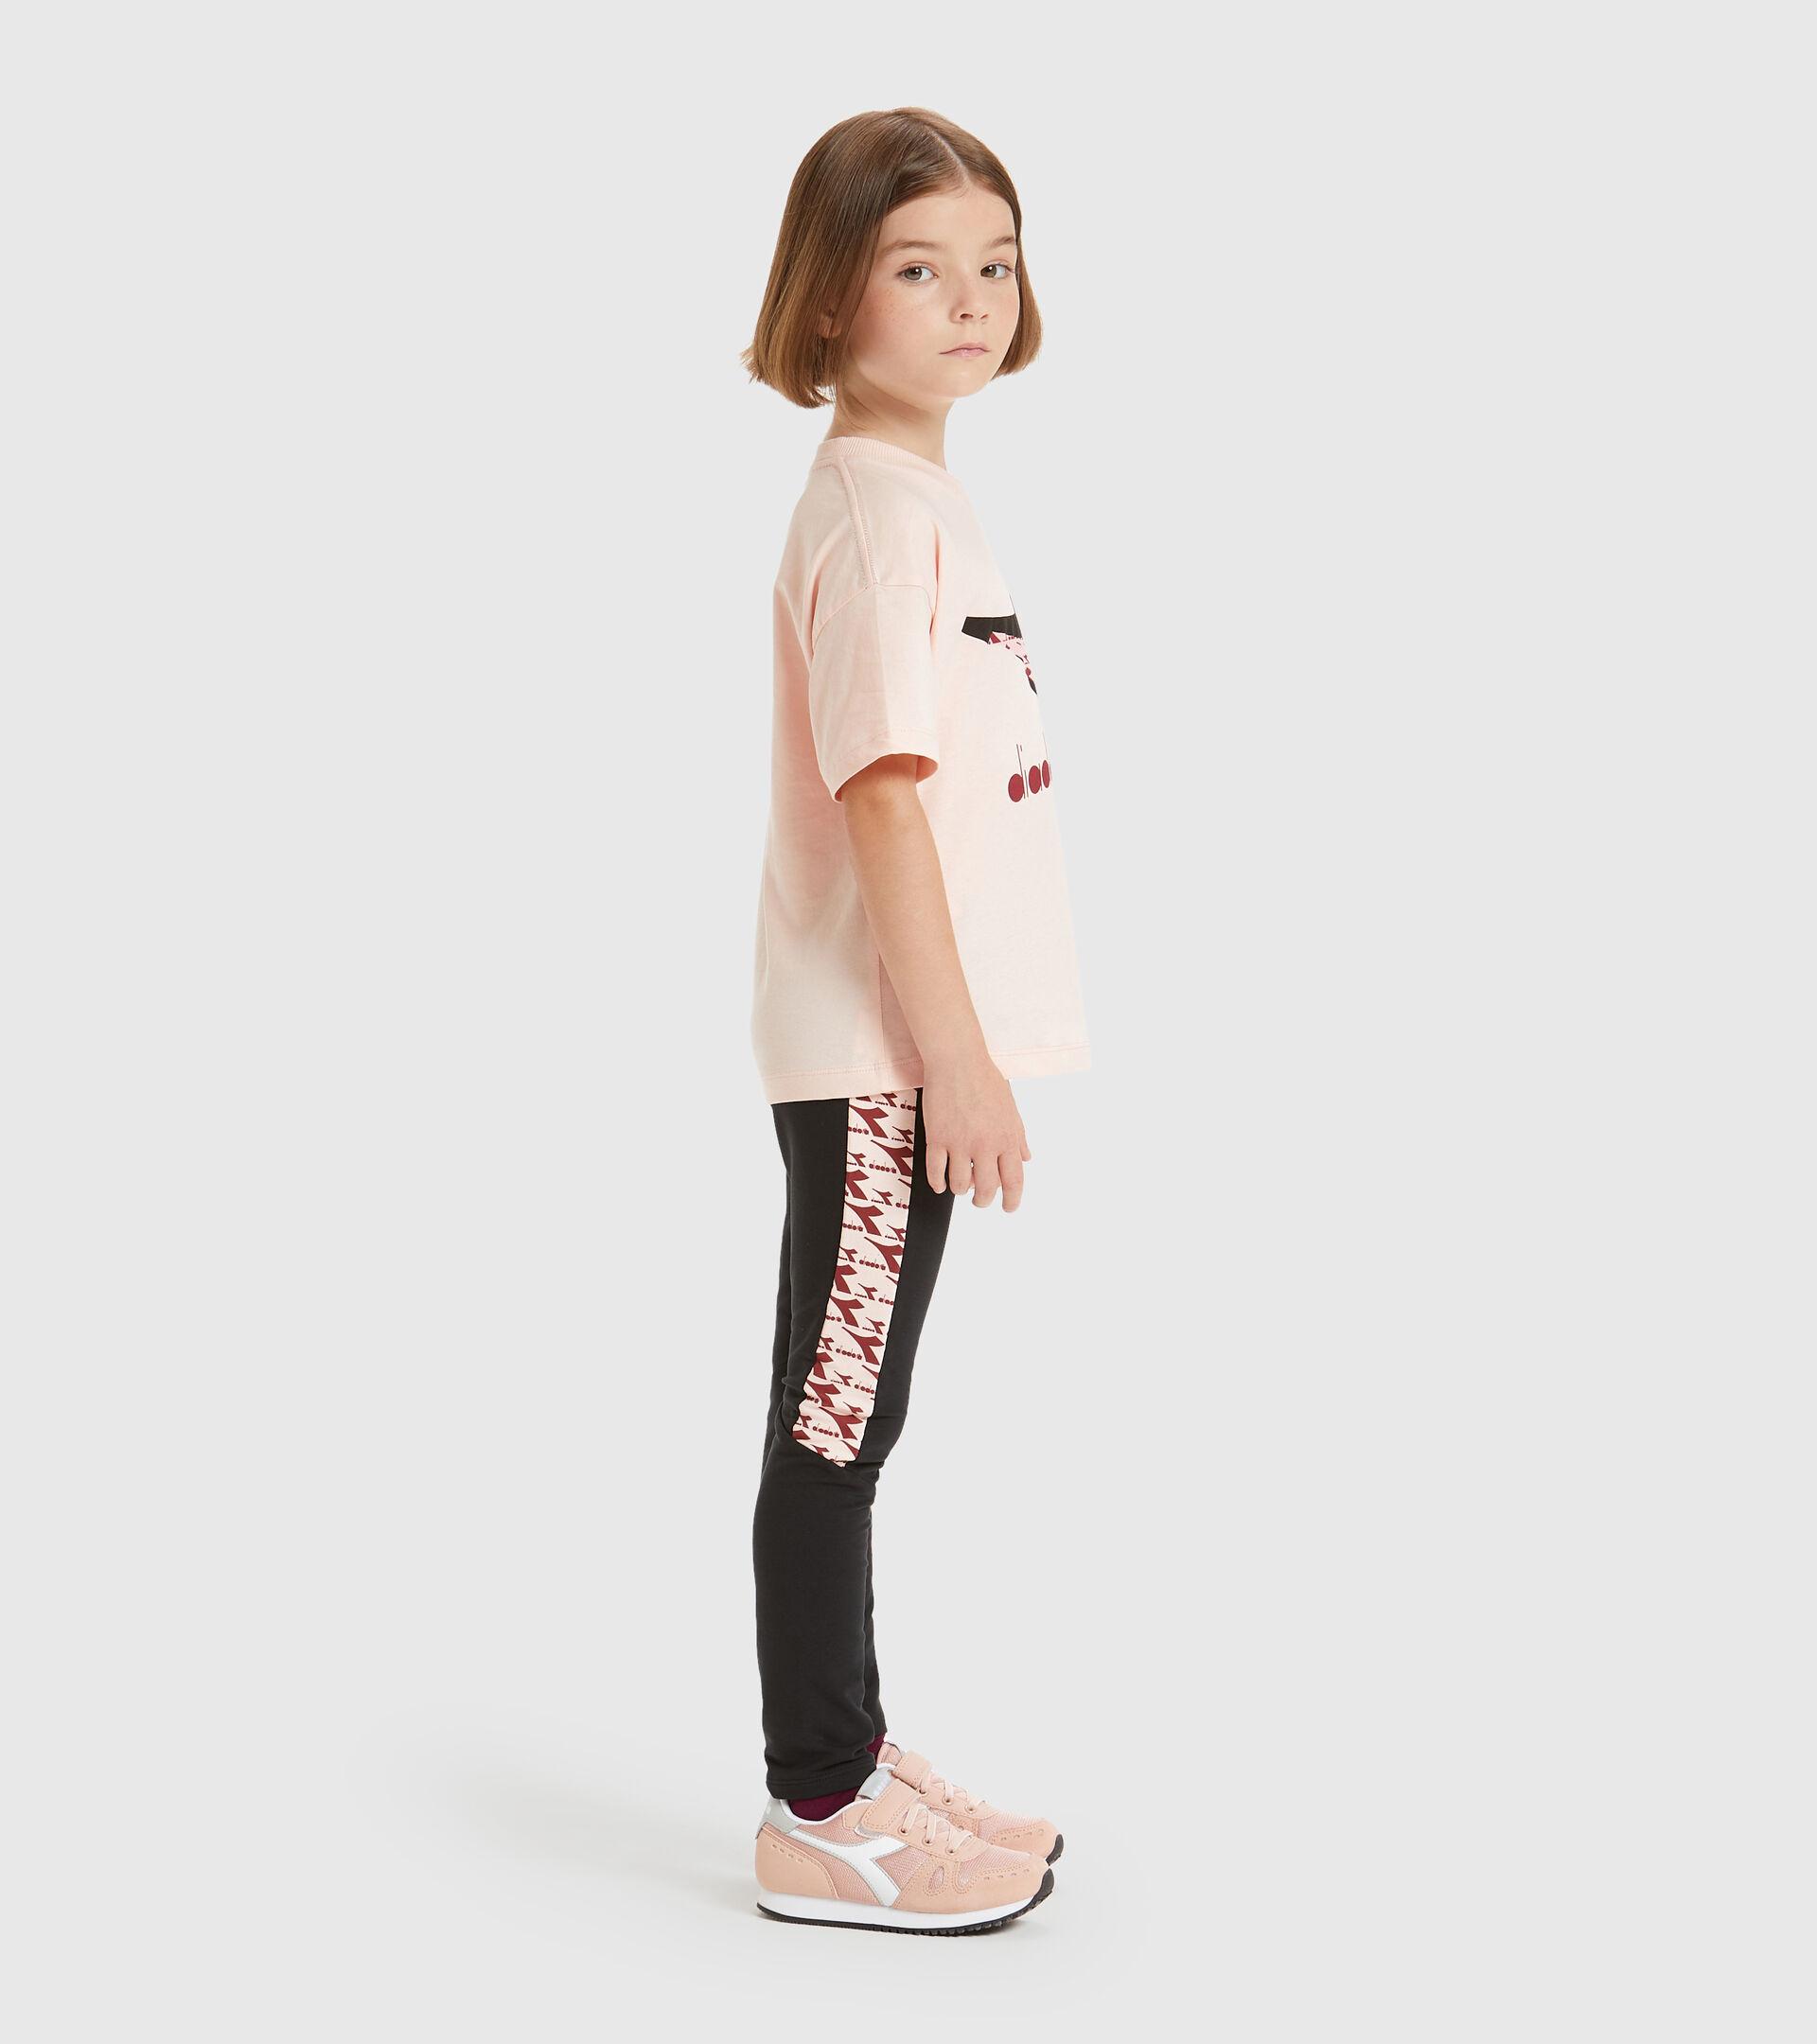 Pantalones deportivos - Niños JG.LEGGINGS TWINKLE NEGRO - Diadora